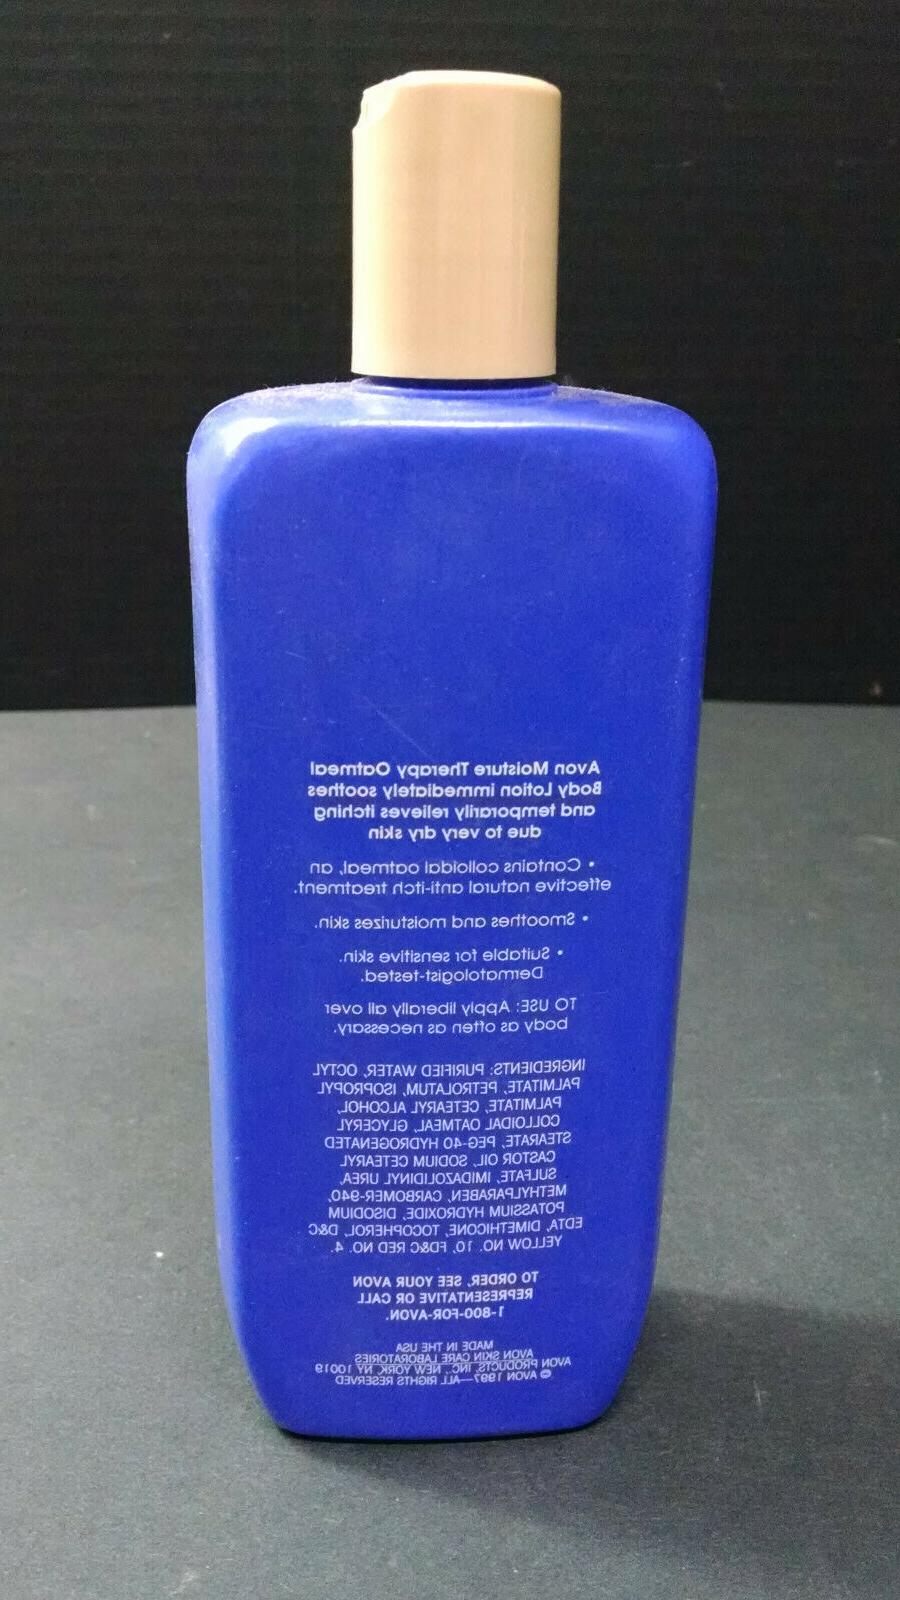 Vintage Avon Moisture Therapy Oatmeal Body Lotion, Dry 13.5 Oz